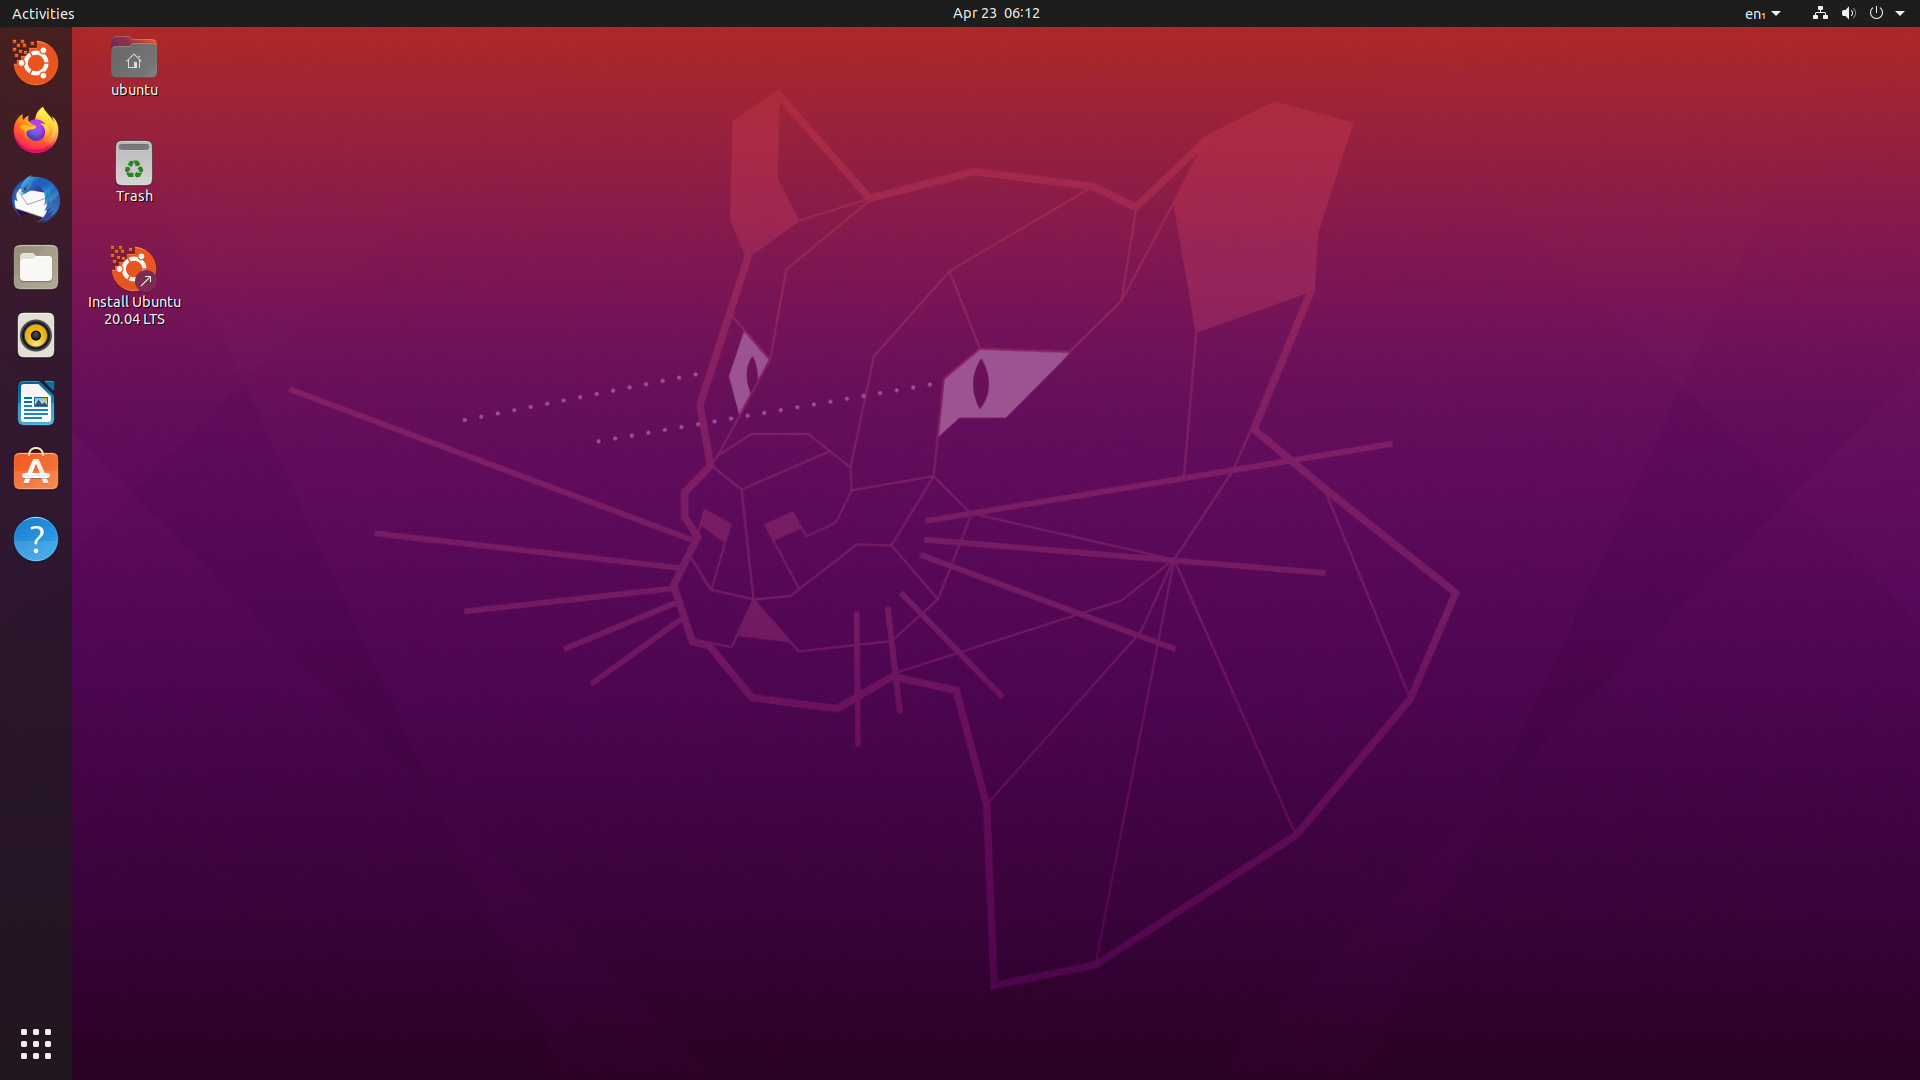 Ubuntu 20.04 LTS (Focal Fossa) mit Gnome 3.36